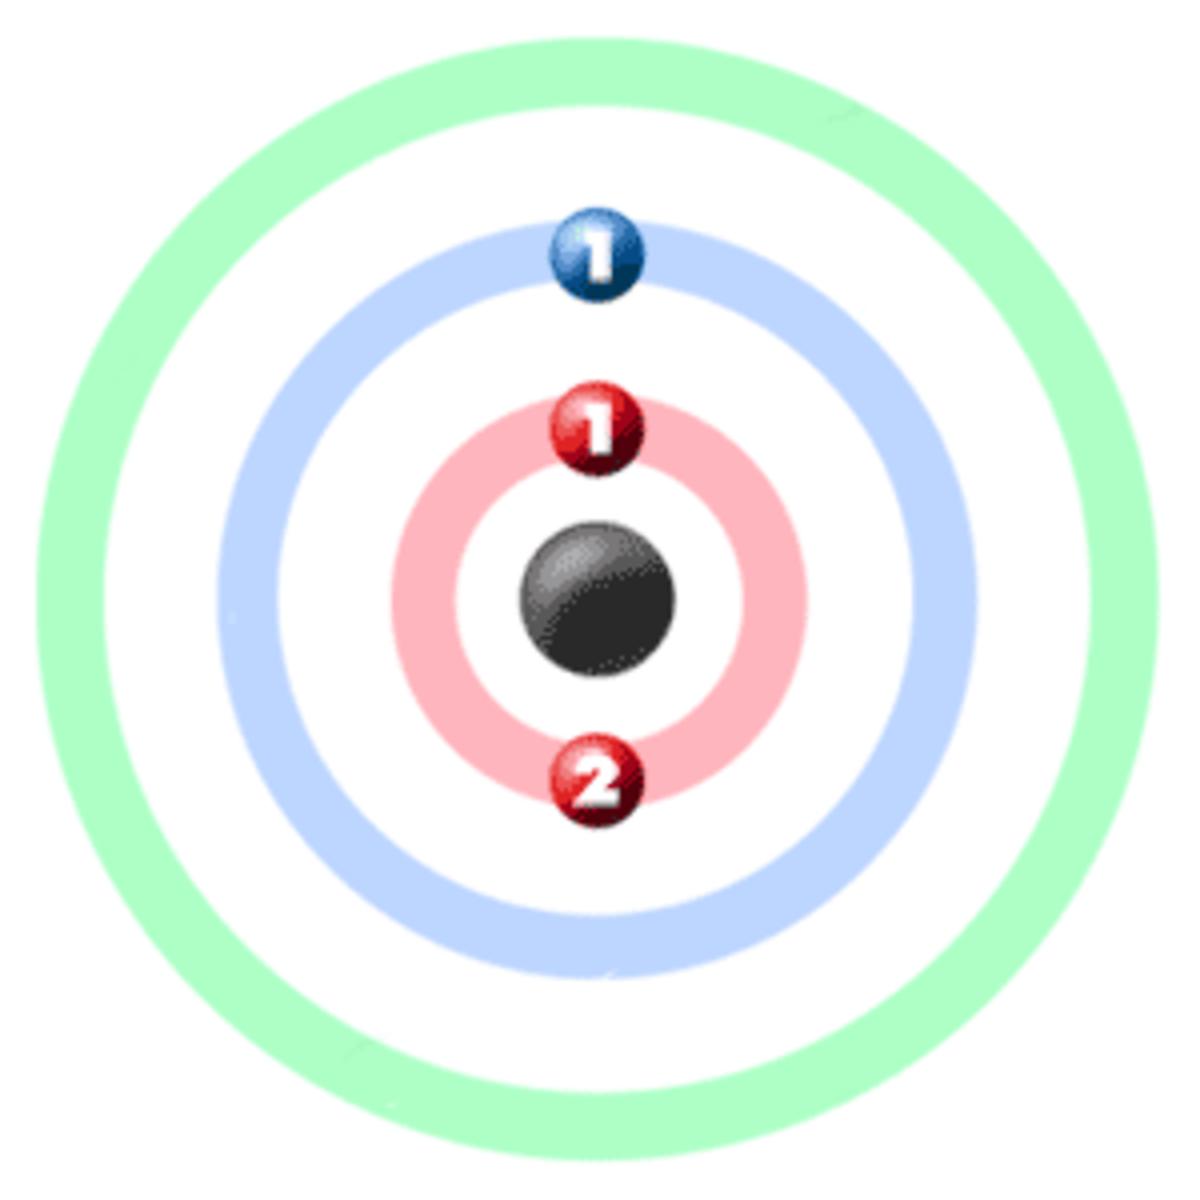 Atomic Structure of Lithium